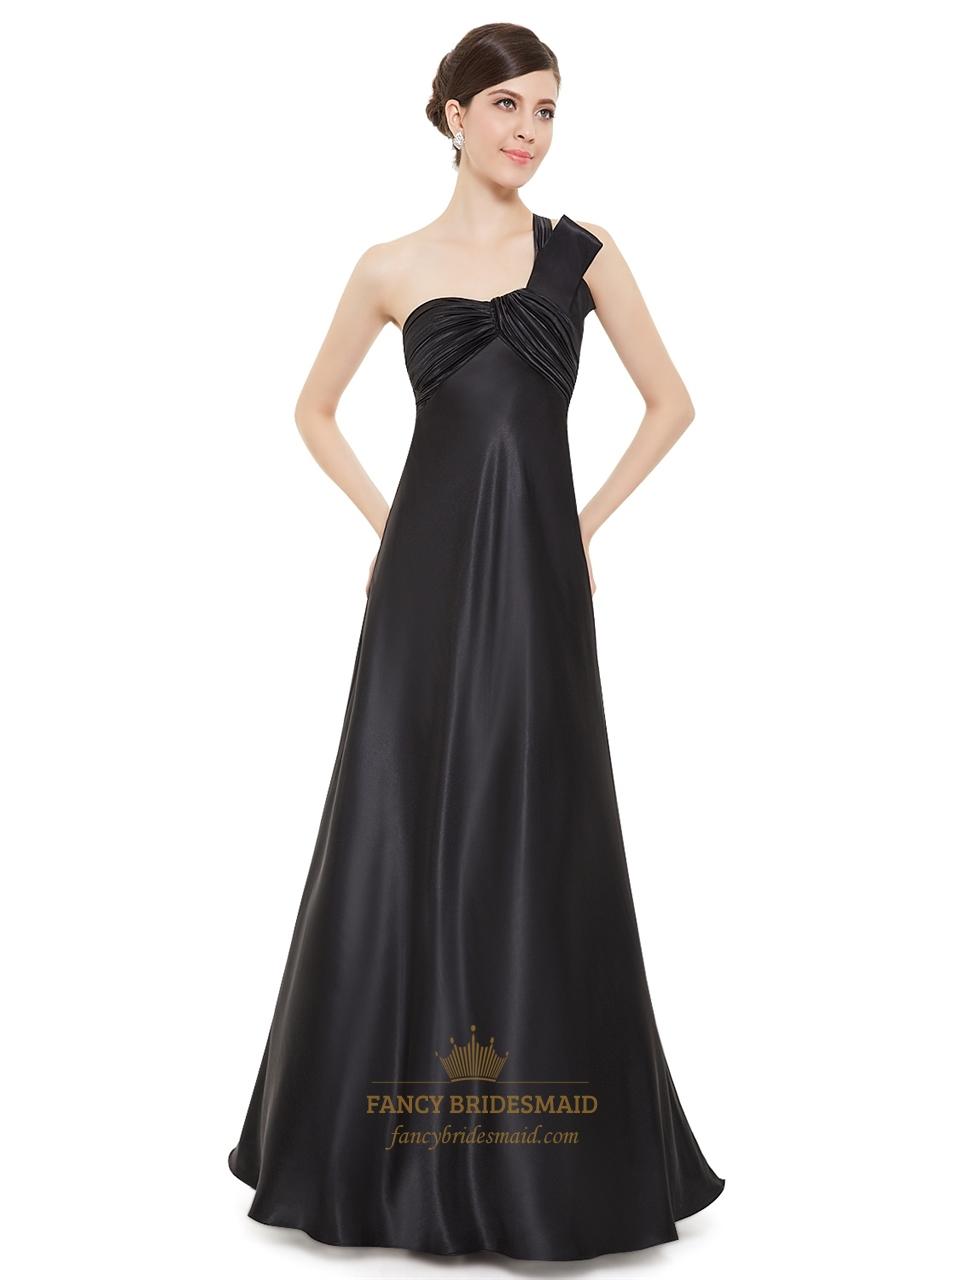 Elegant long black pleated empire waist one shoulder for Black bridesmaids dresses wedding